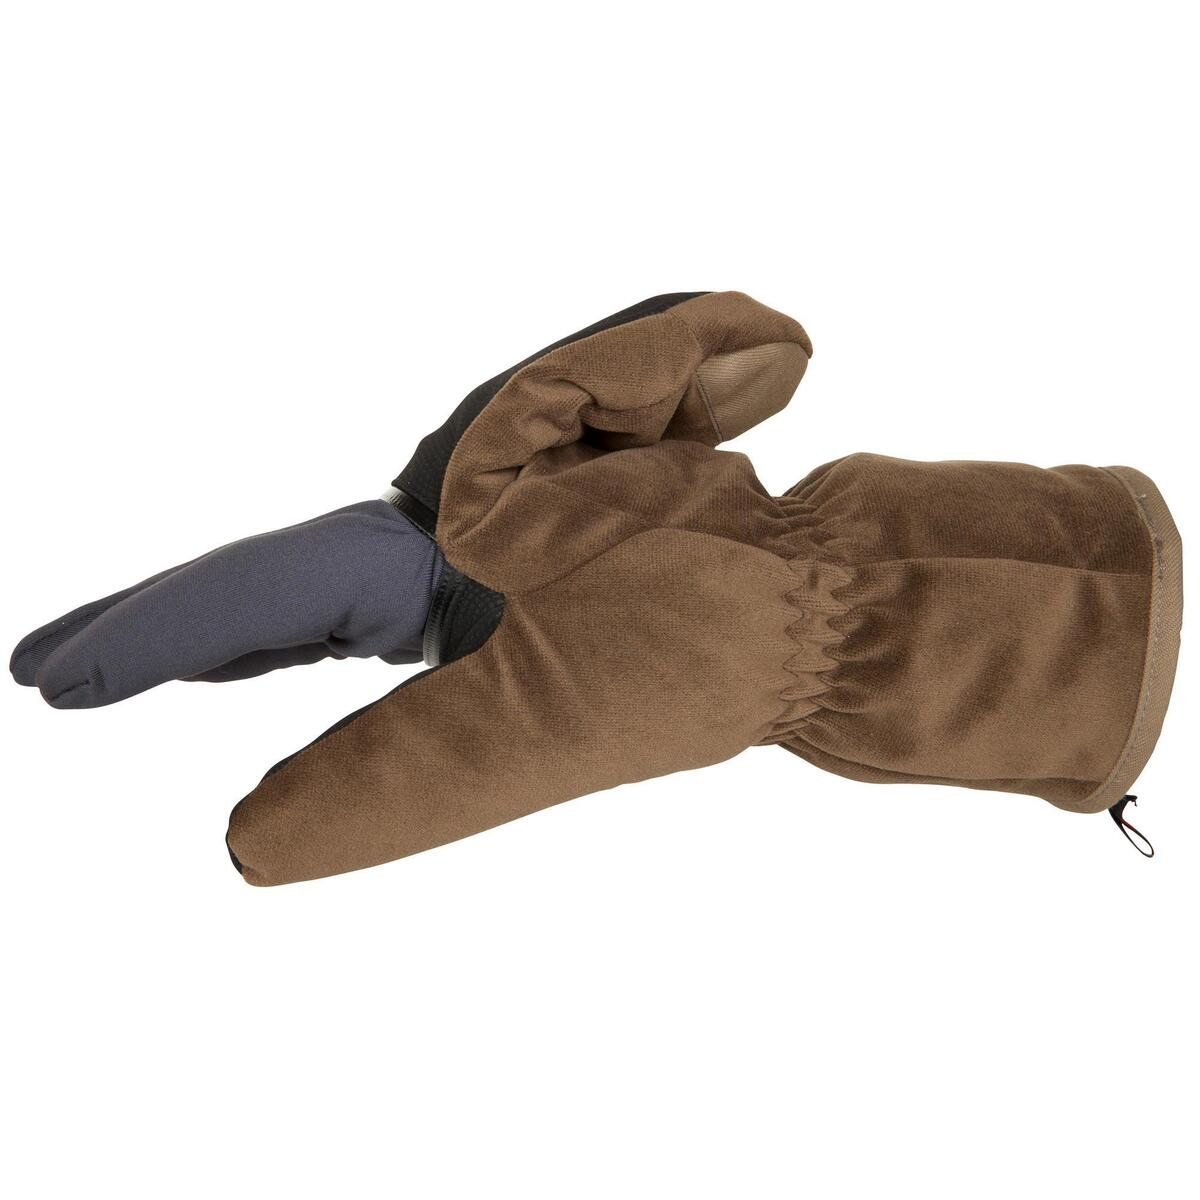 Bild 4 von Jagd-Handschuhe Toundra 500 braun